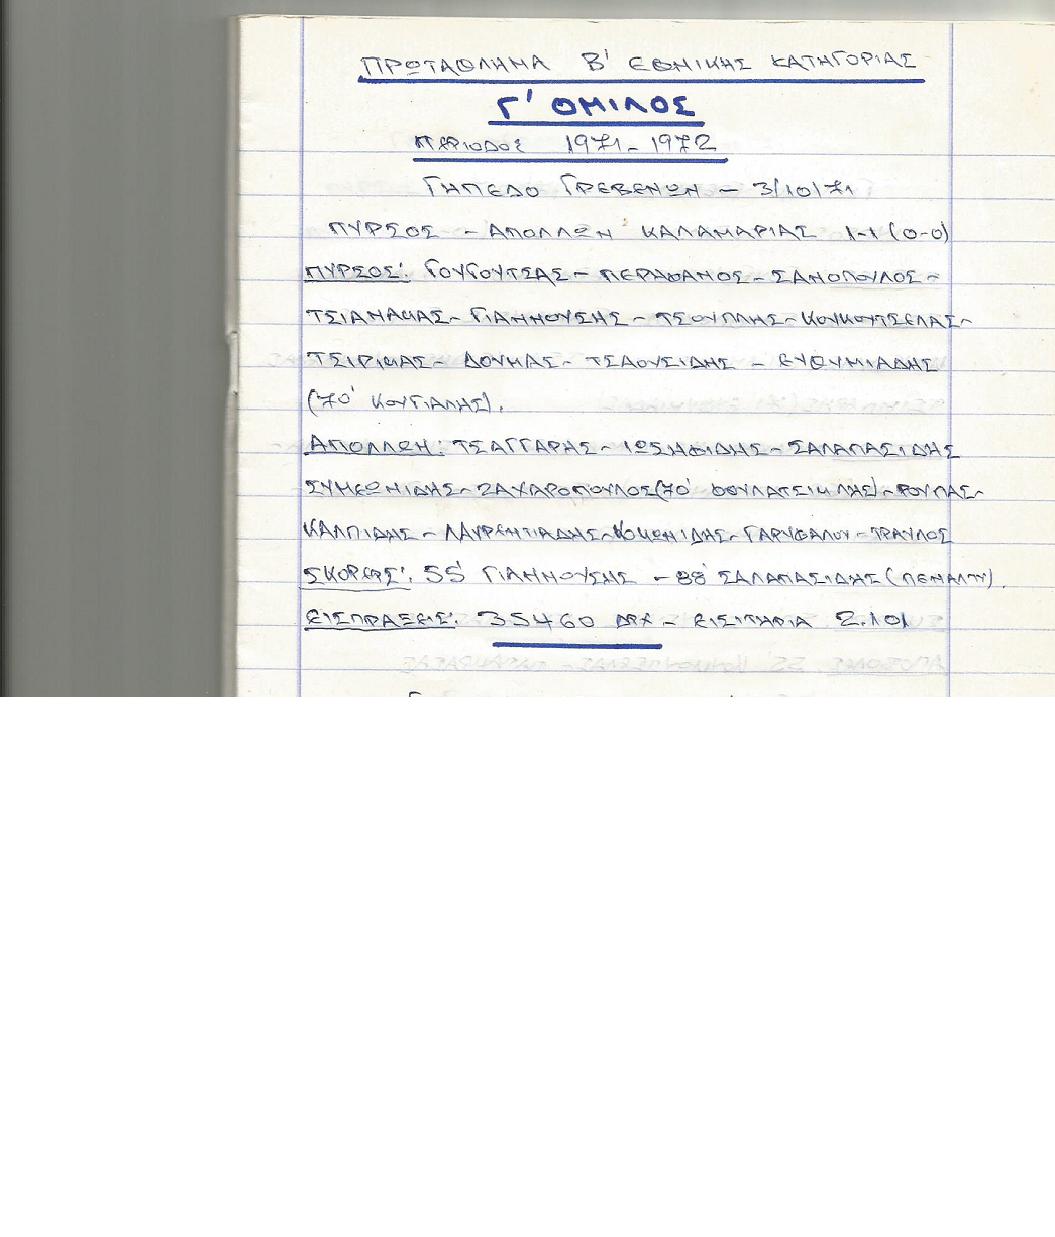 1-30-11-20106pyrsos1971